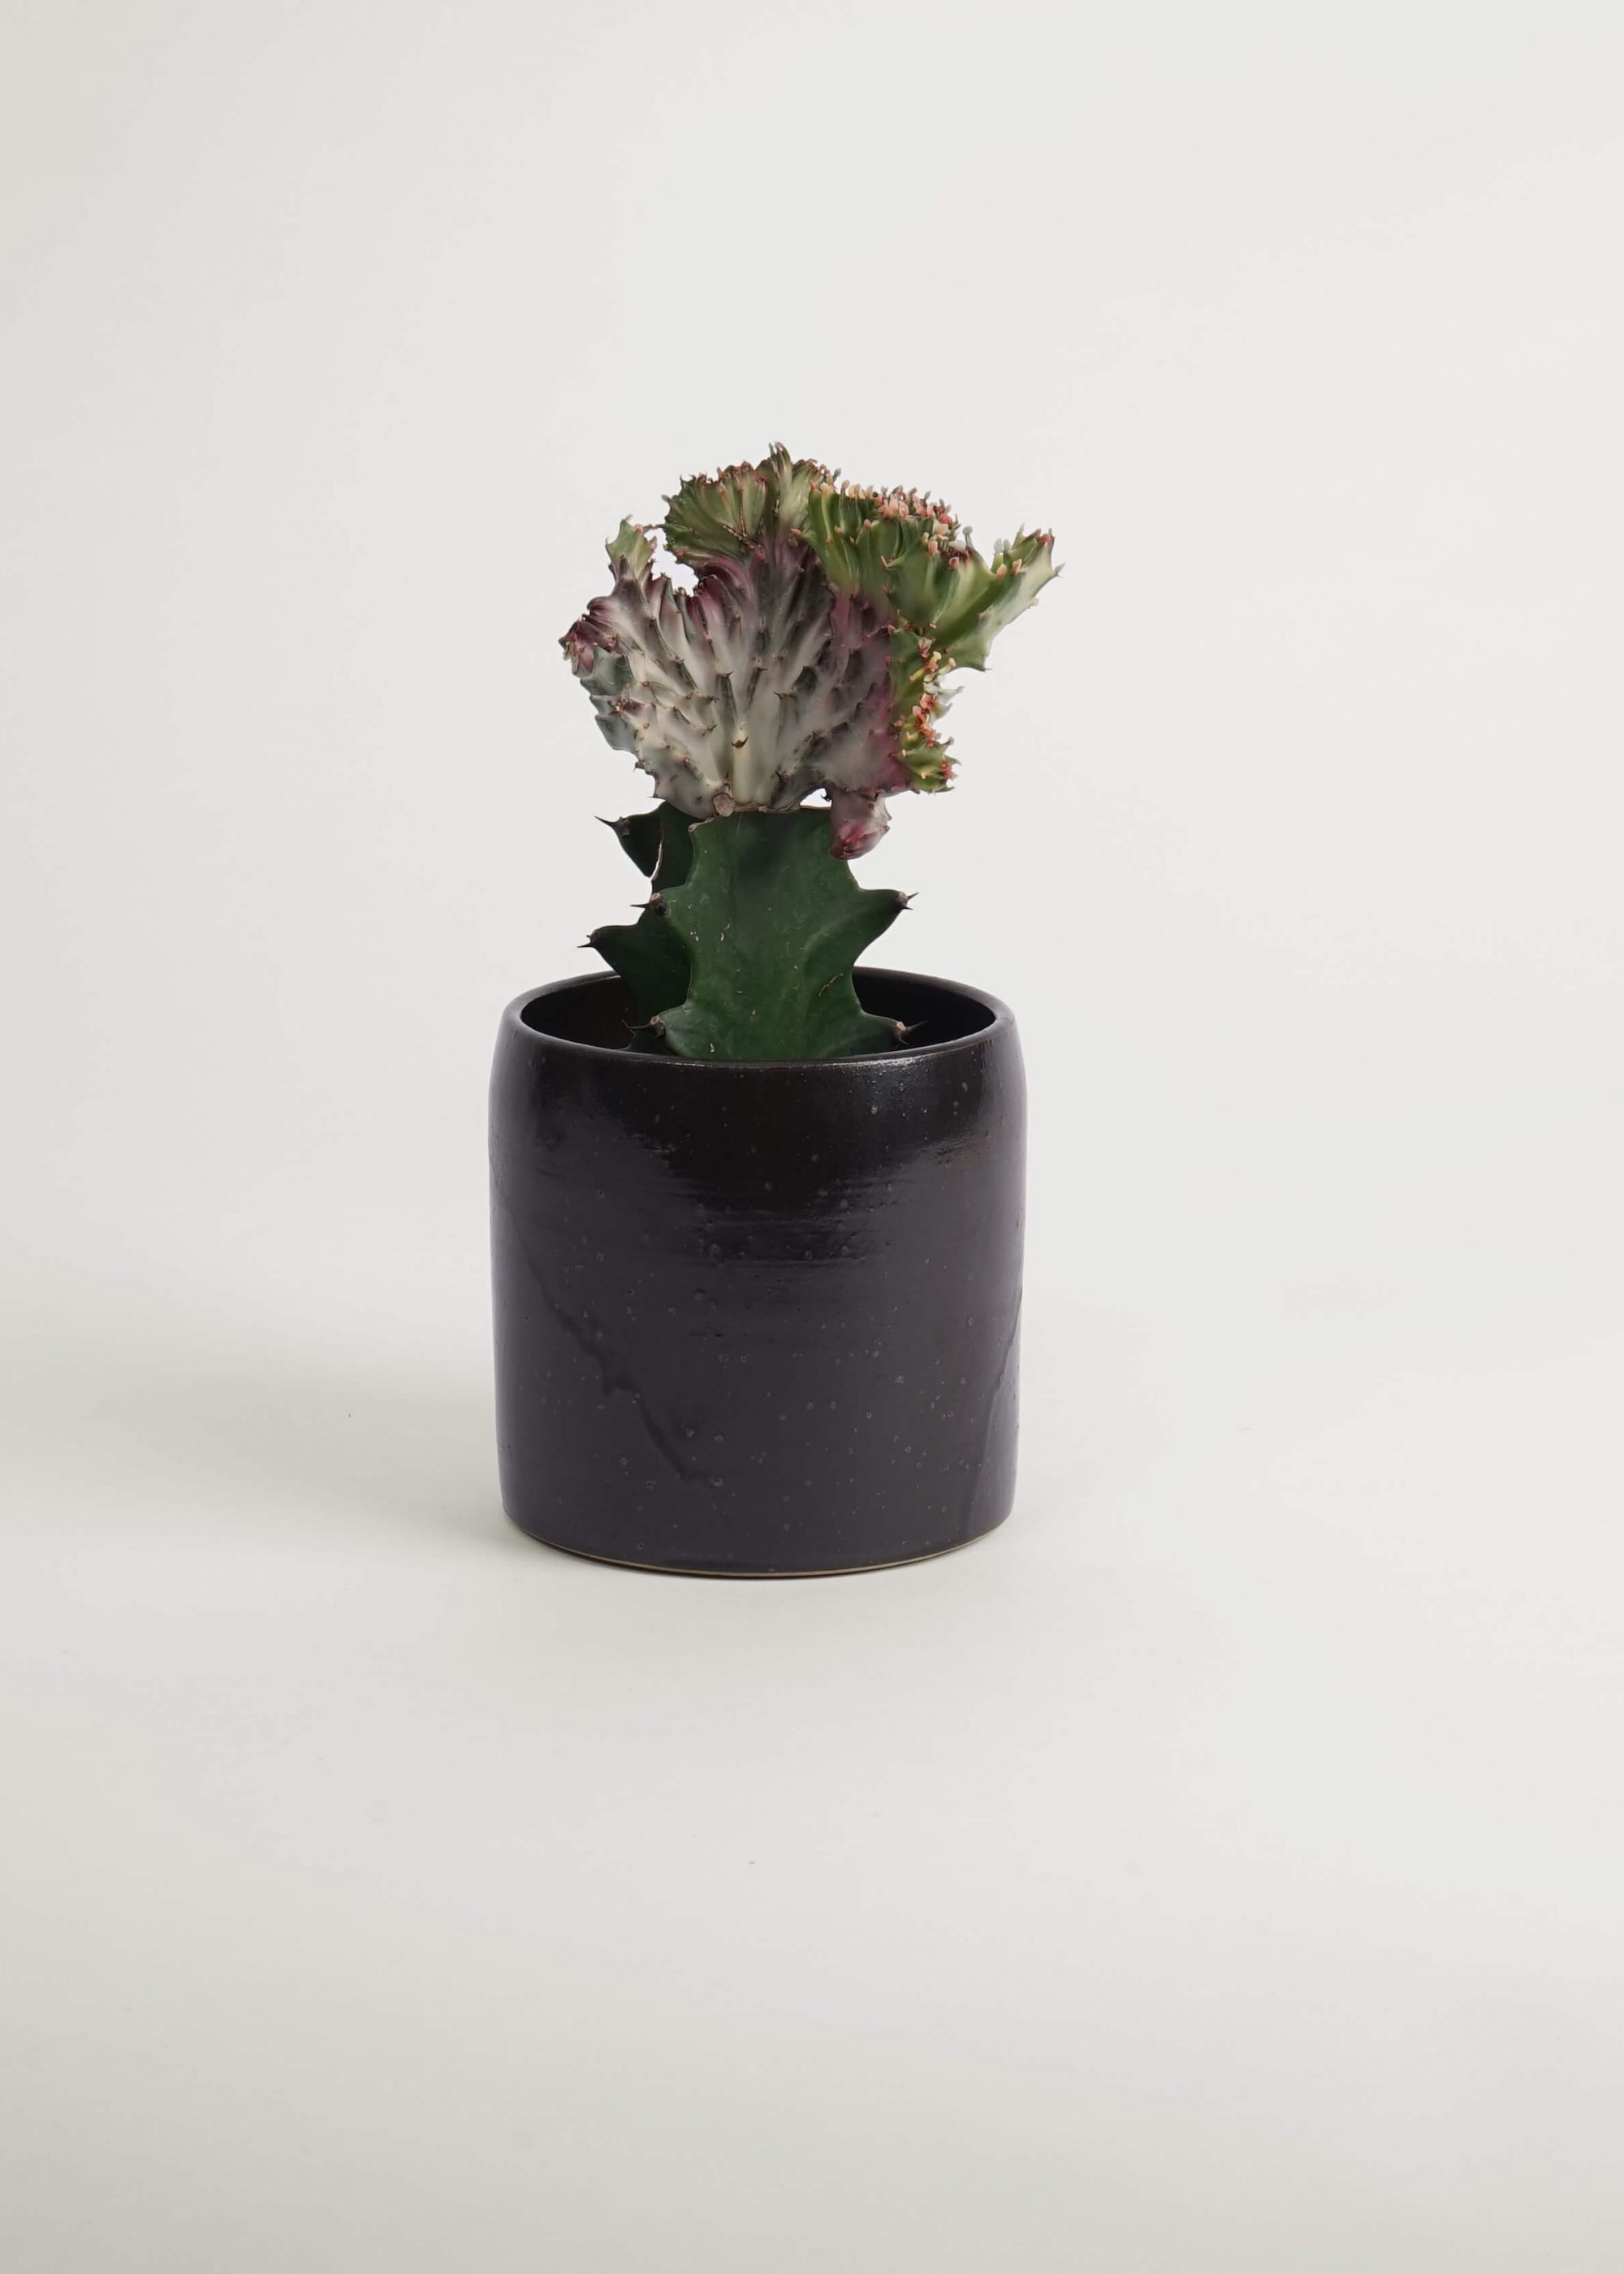 Product image for N° ICD8 Burri Planter S